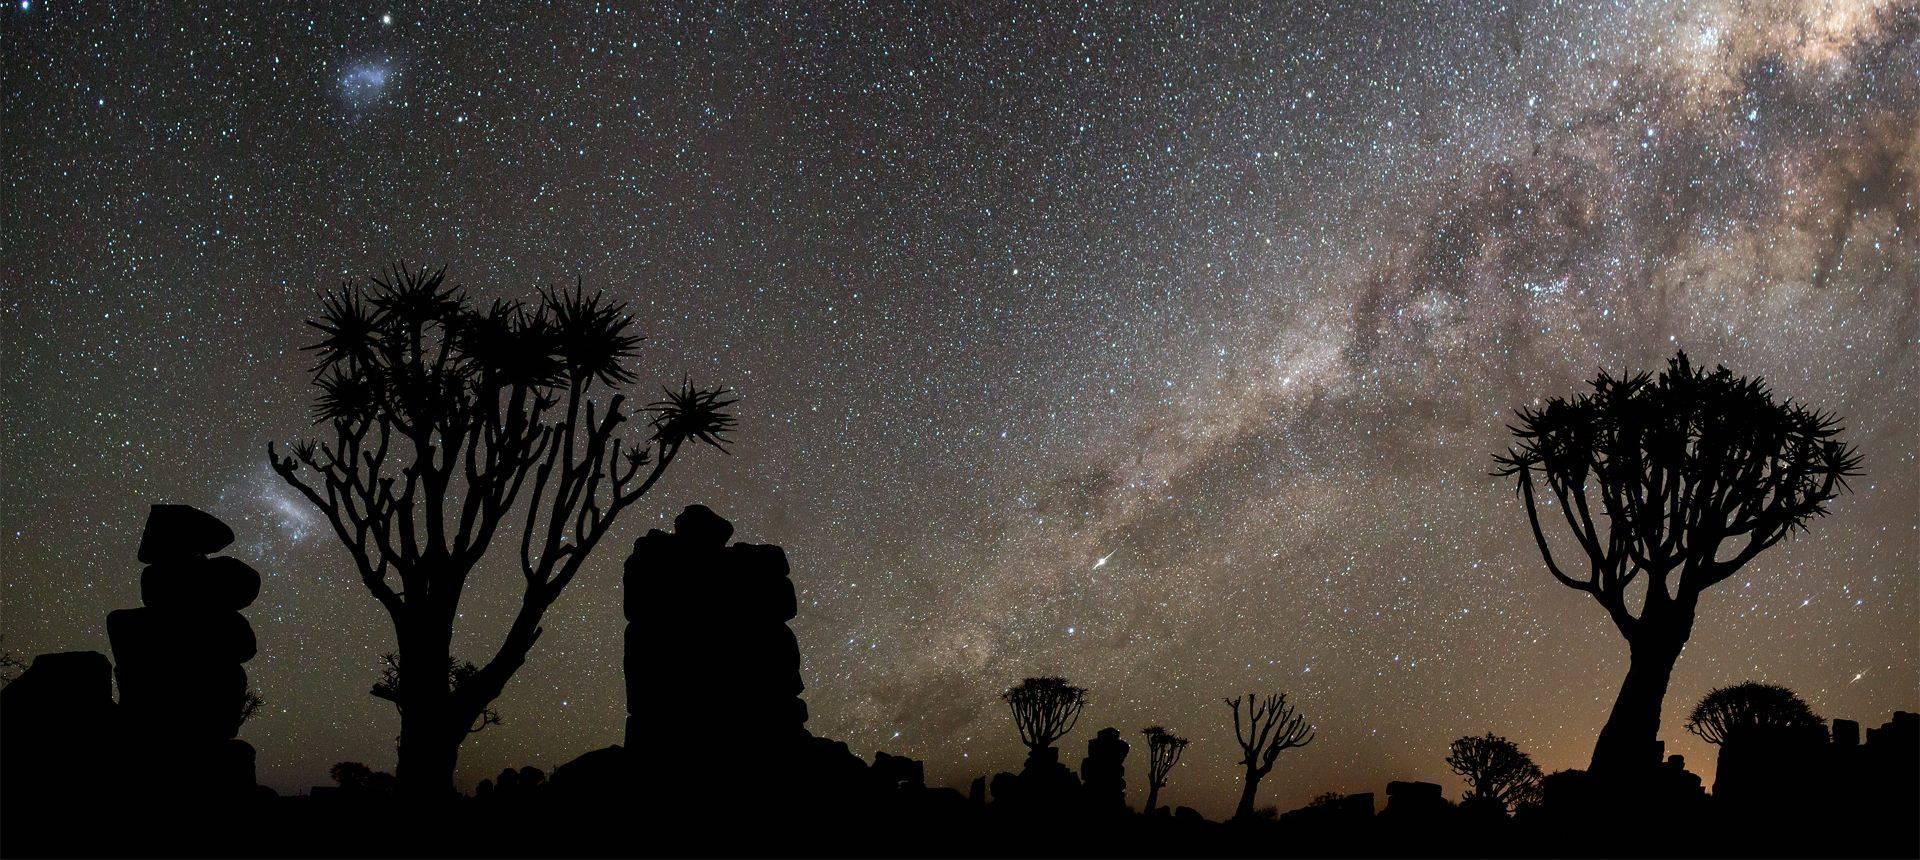 Quiver Trees And Three Galaxies, Mesosaurus Fossil Site, Keetmanshoop © R Harvey